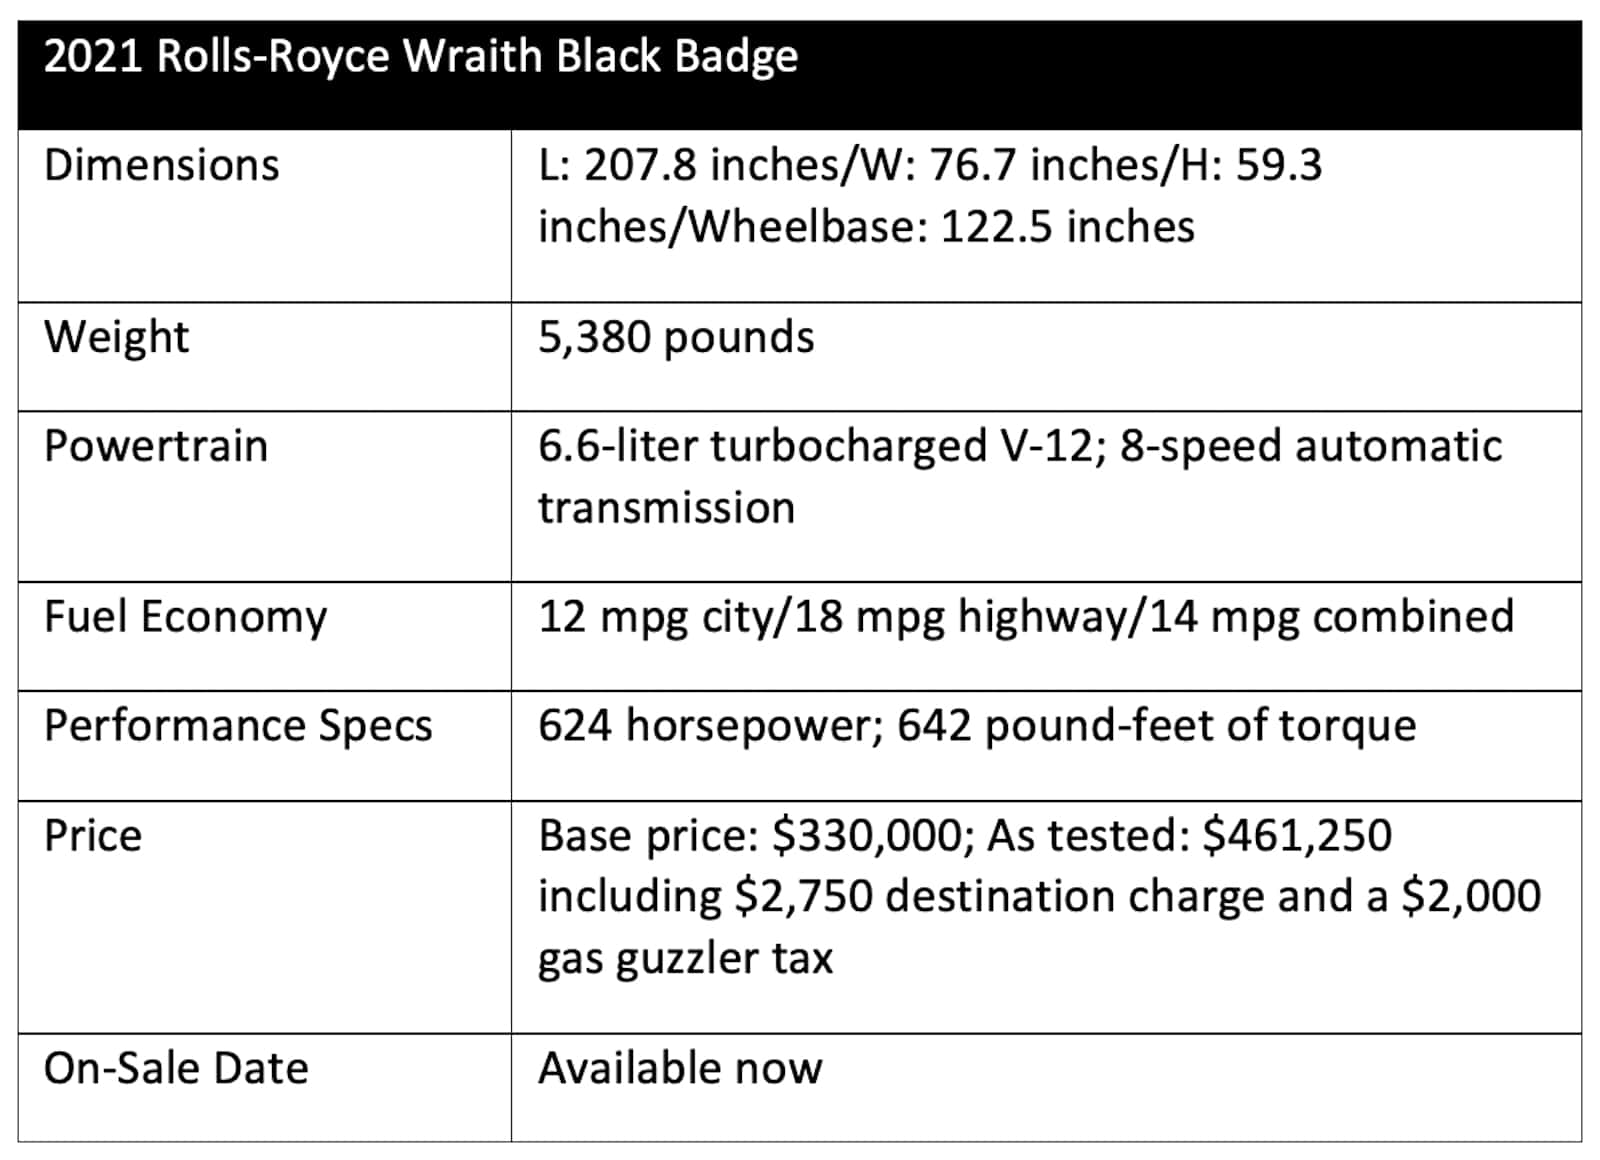 2021 Rolls-Royce Wraith Black Badge specifications